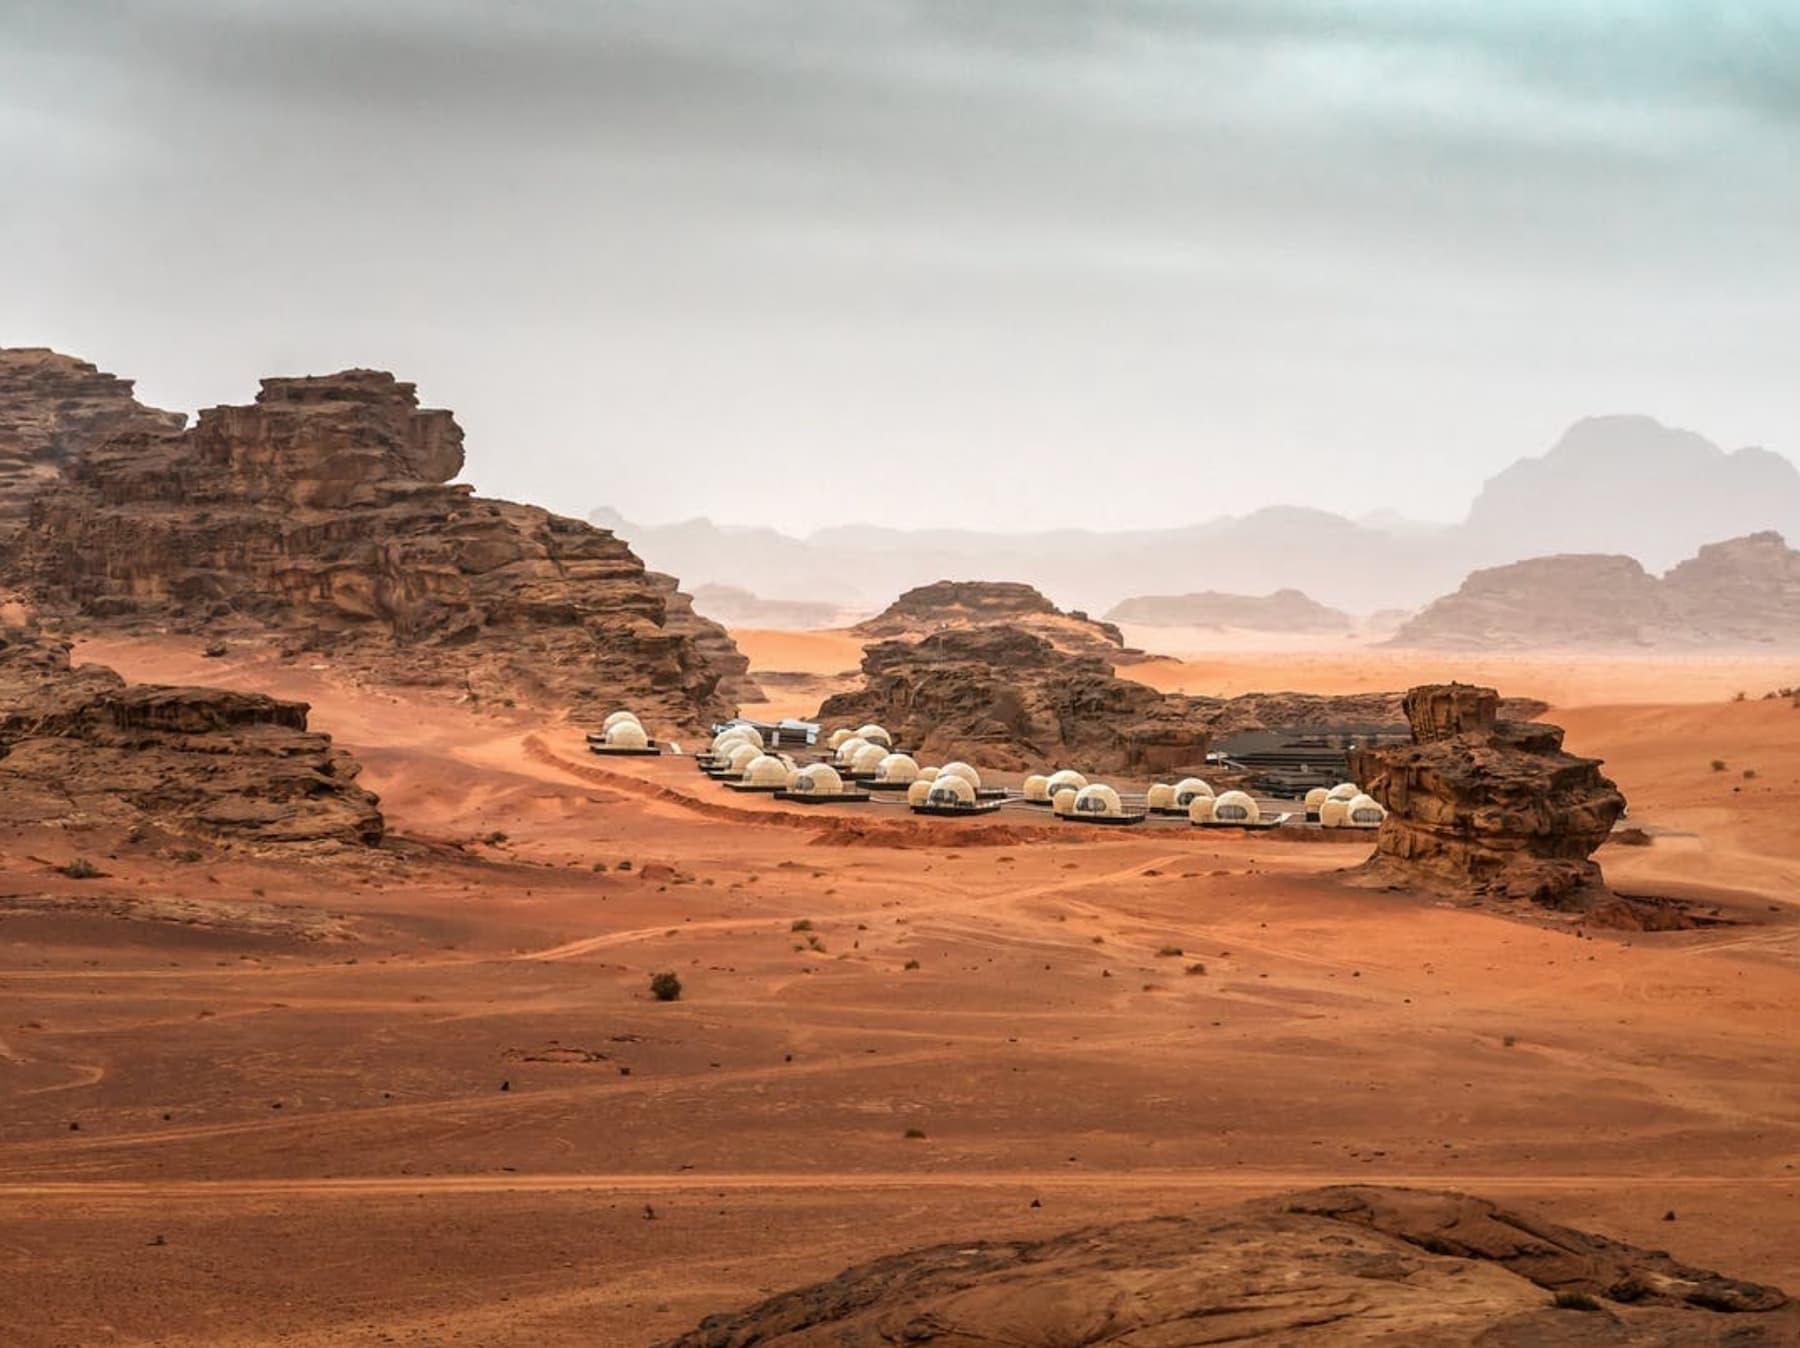 Martian Dome hotel in desert in Jordan